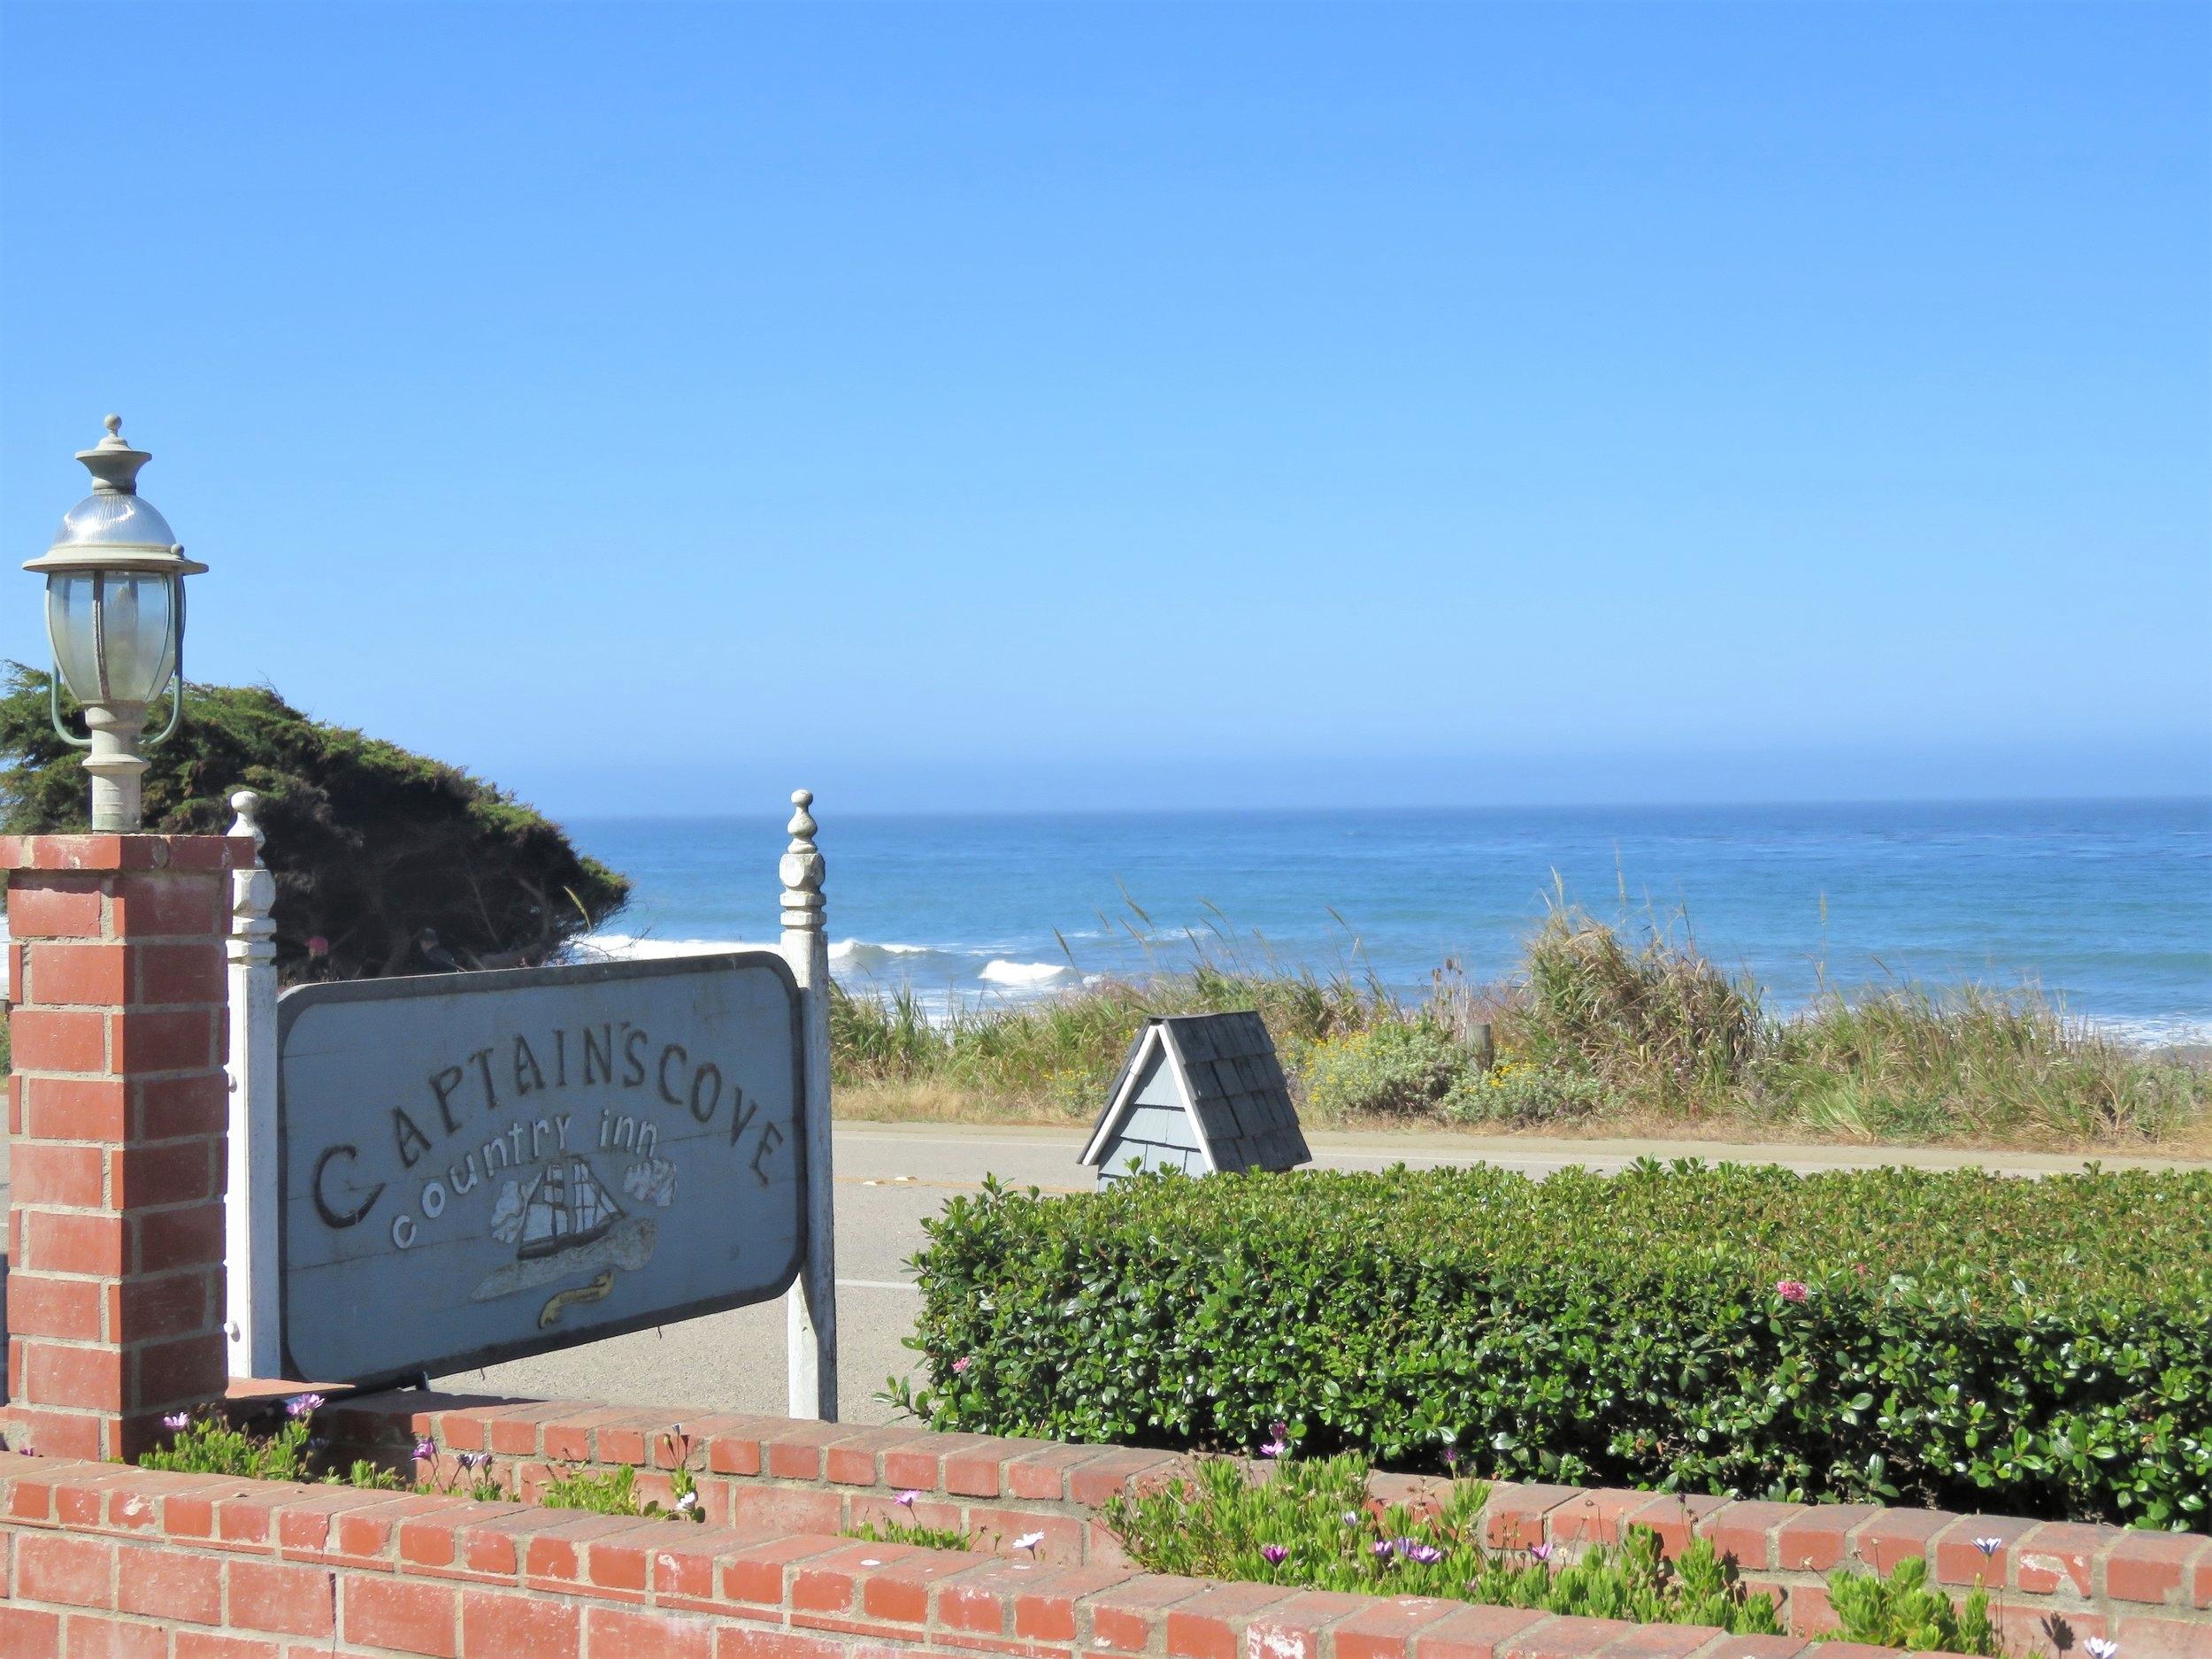 California hotels | Hotel deals | Beachfront hotels | Beach vacation | California vacation | Pacific coast